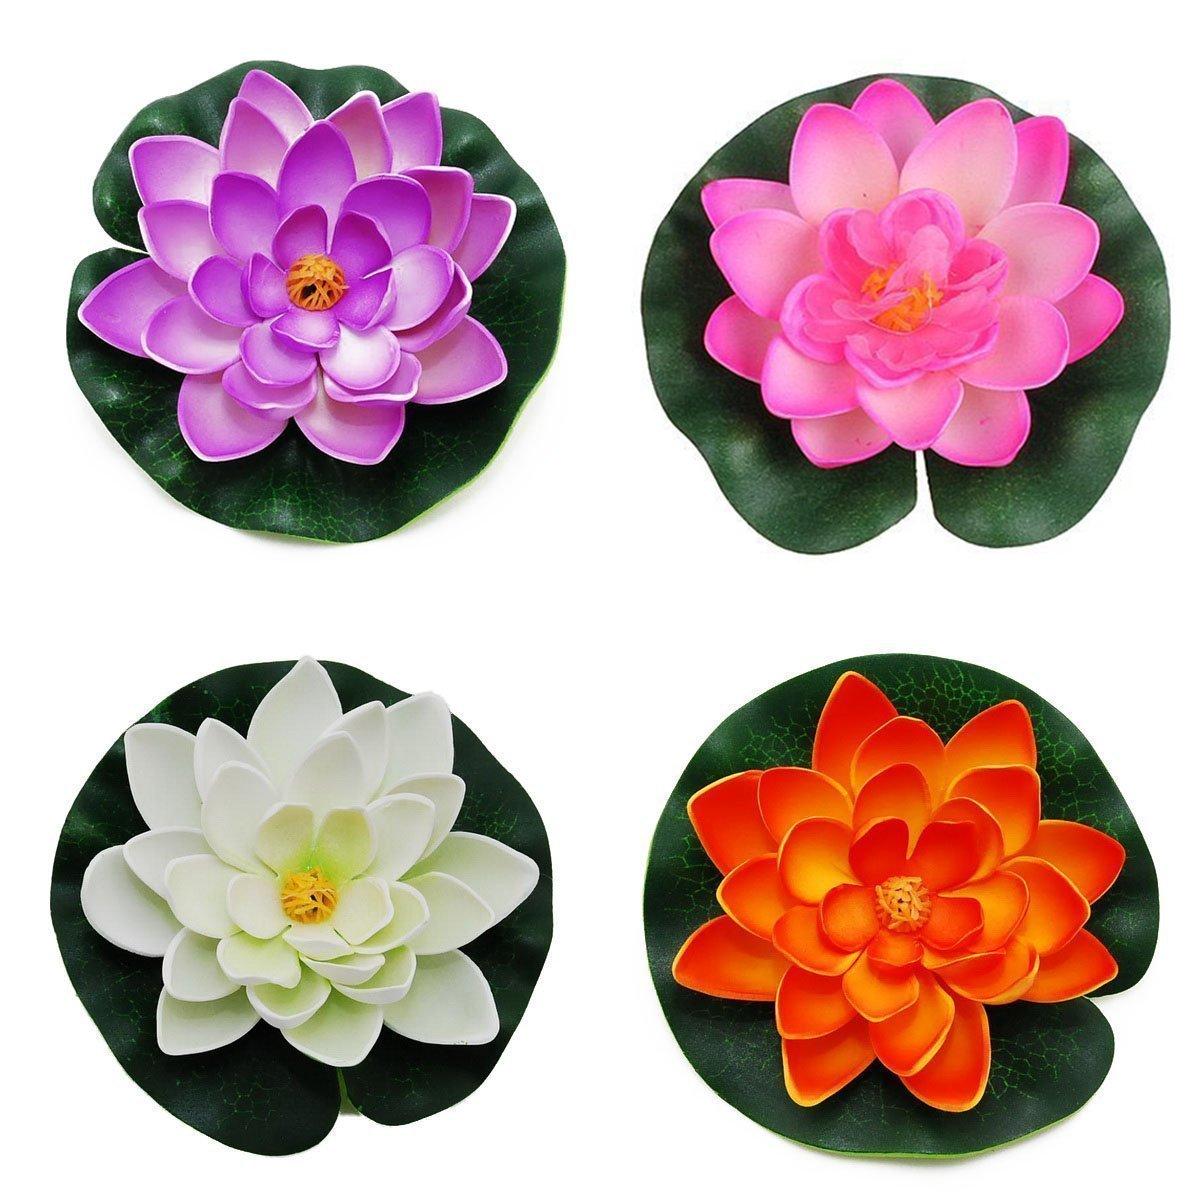 Gemini_mall® Floating Pond Decor Water Lily/Lotus Foam Flower, 10cm/3.94